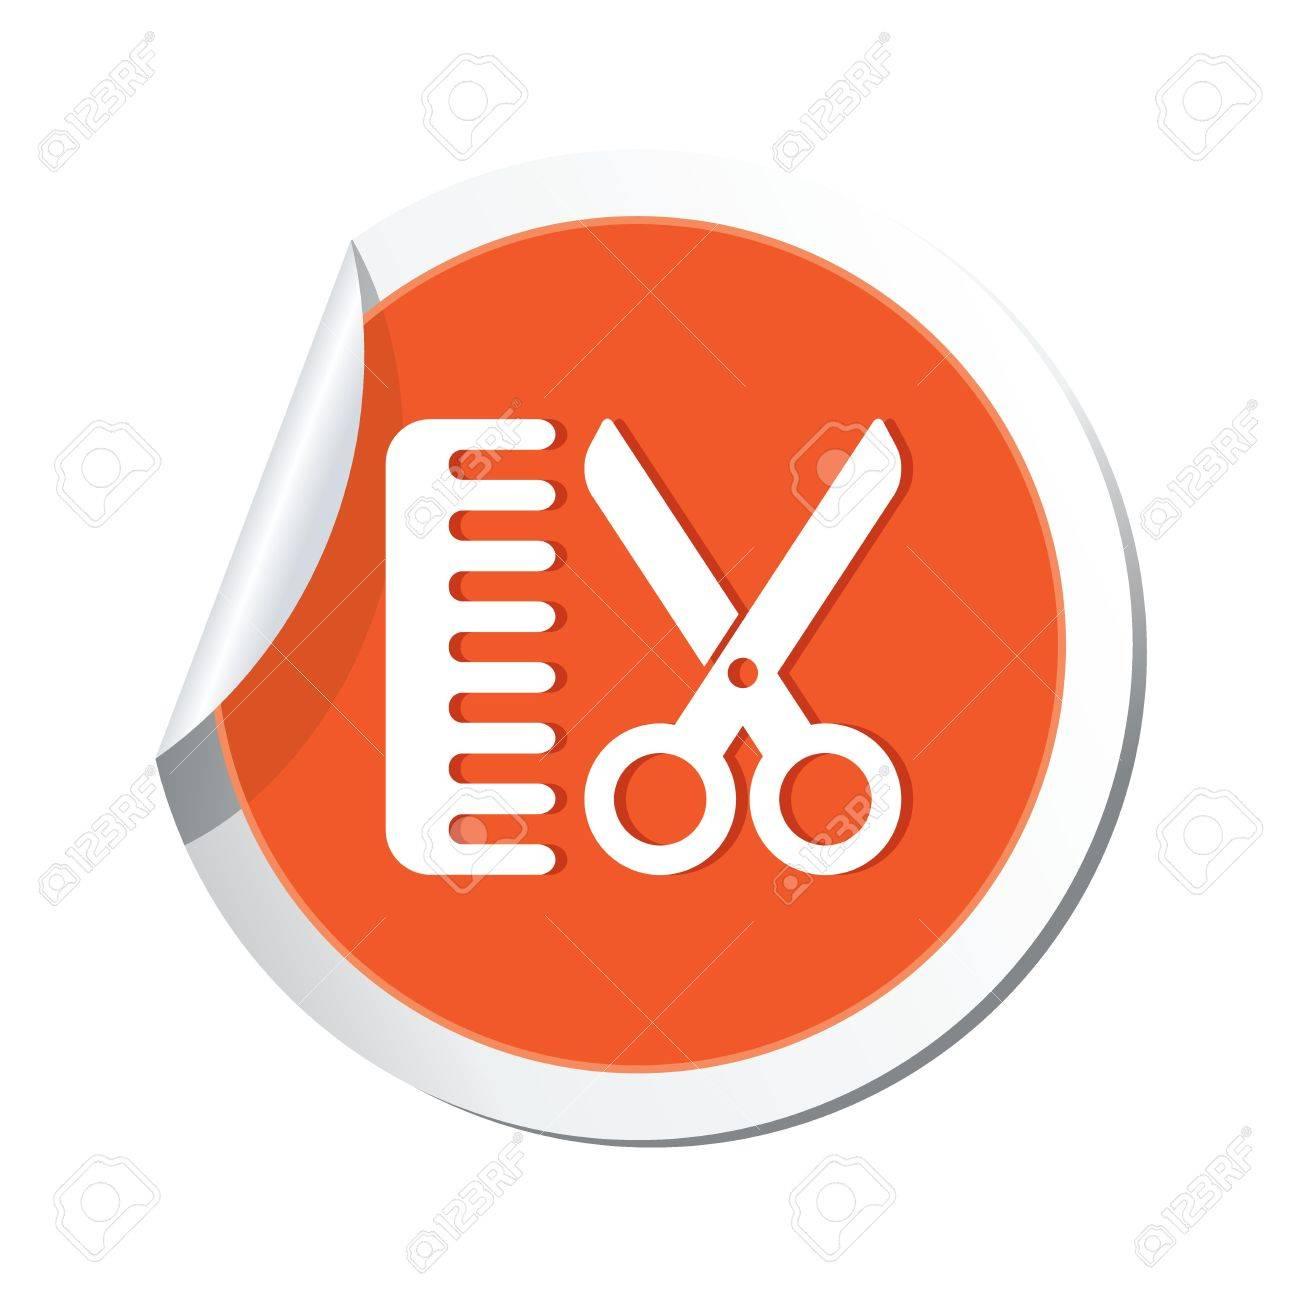 Hair salon icon  Vector illustration Stock Vector - 23471844